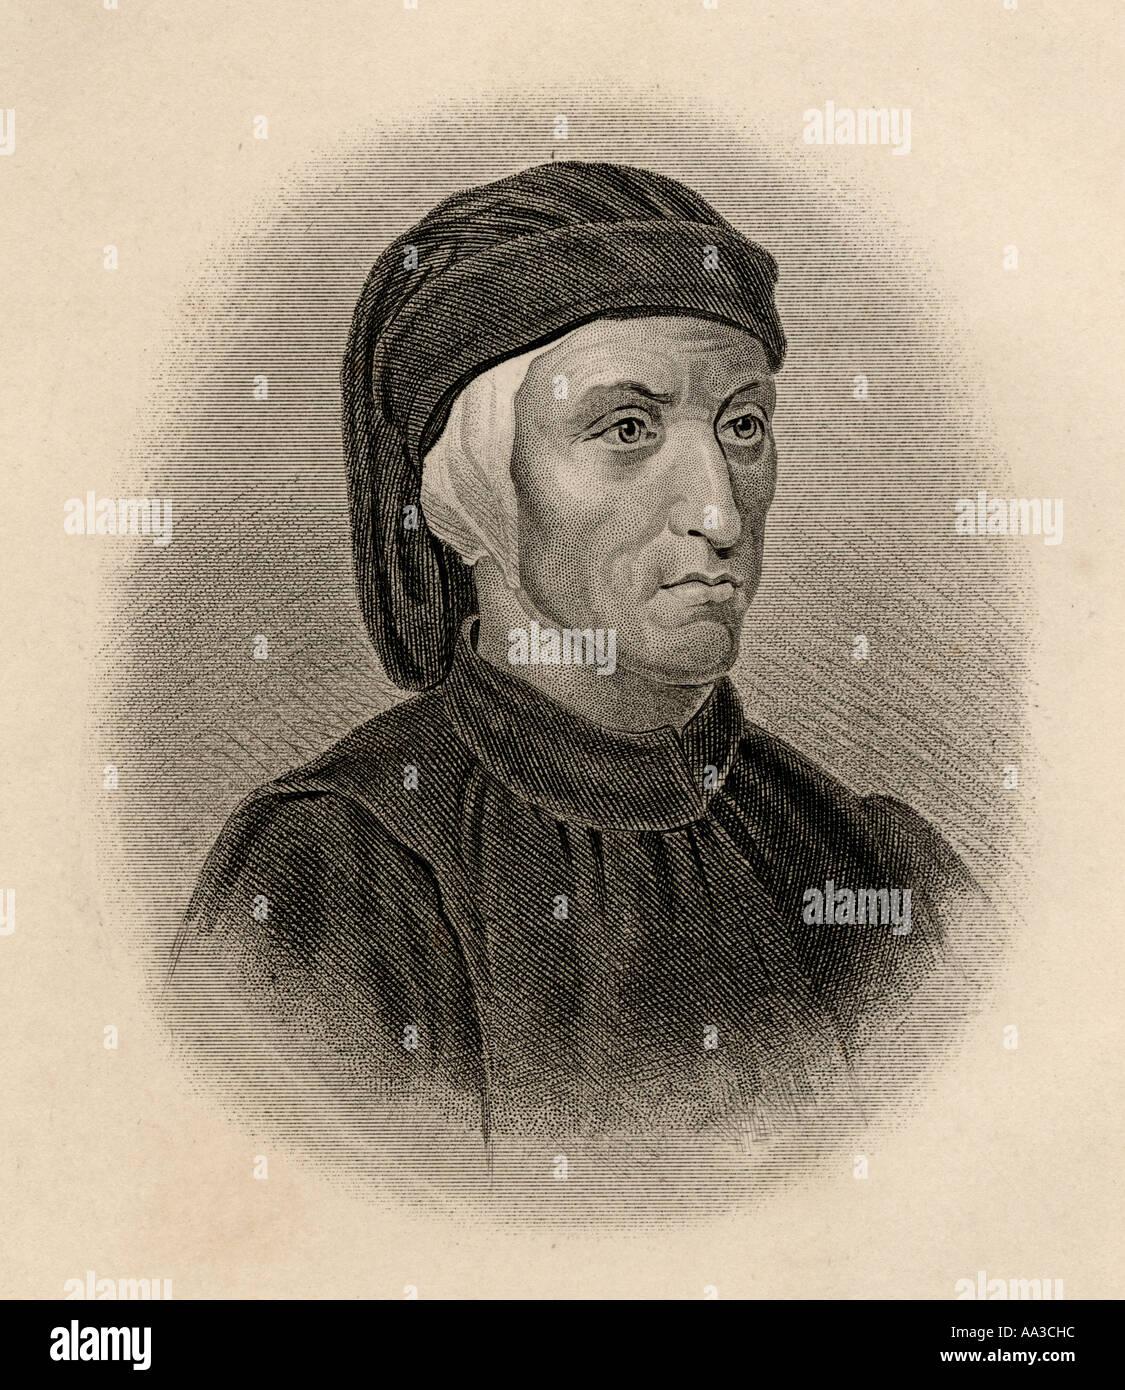 Dante Alighieri: biography, dates of life, creativity